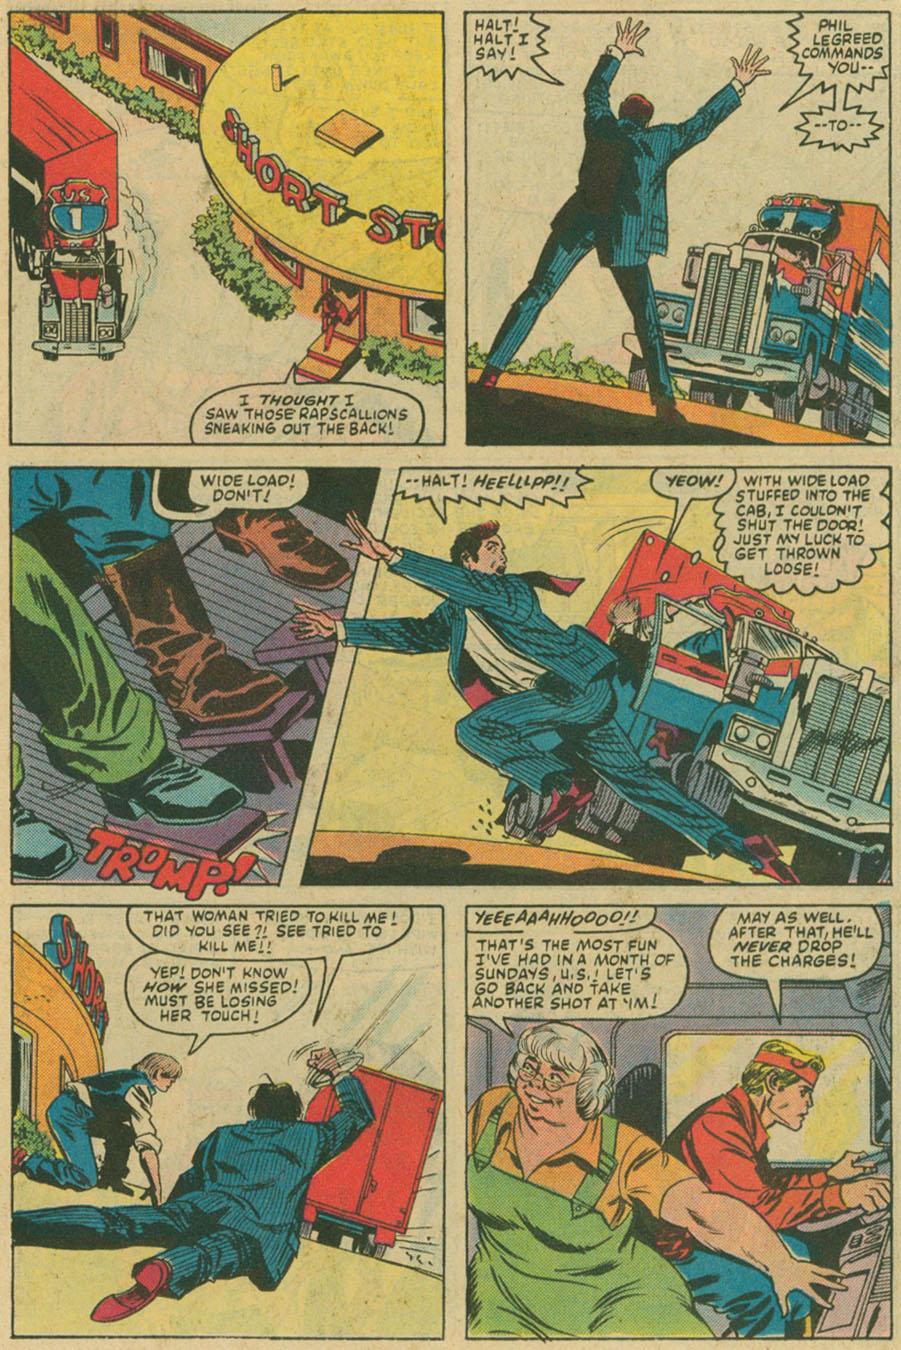 Read online U.S. 1 comic -  Issue #6 - 9